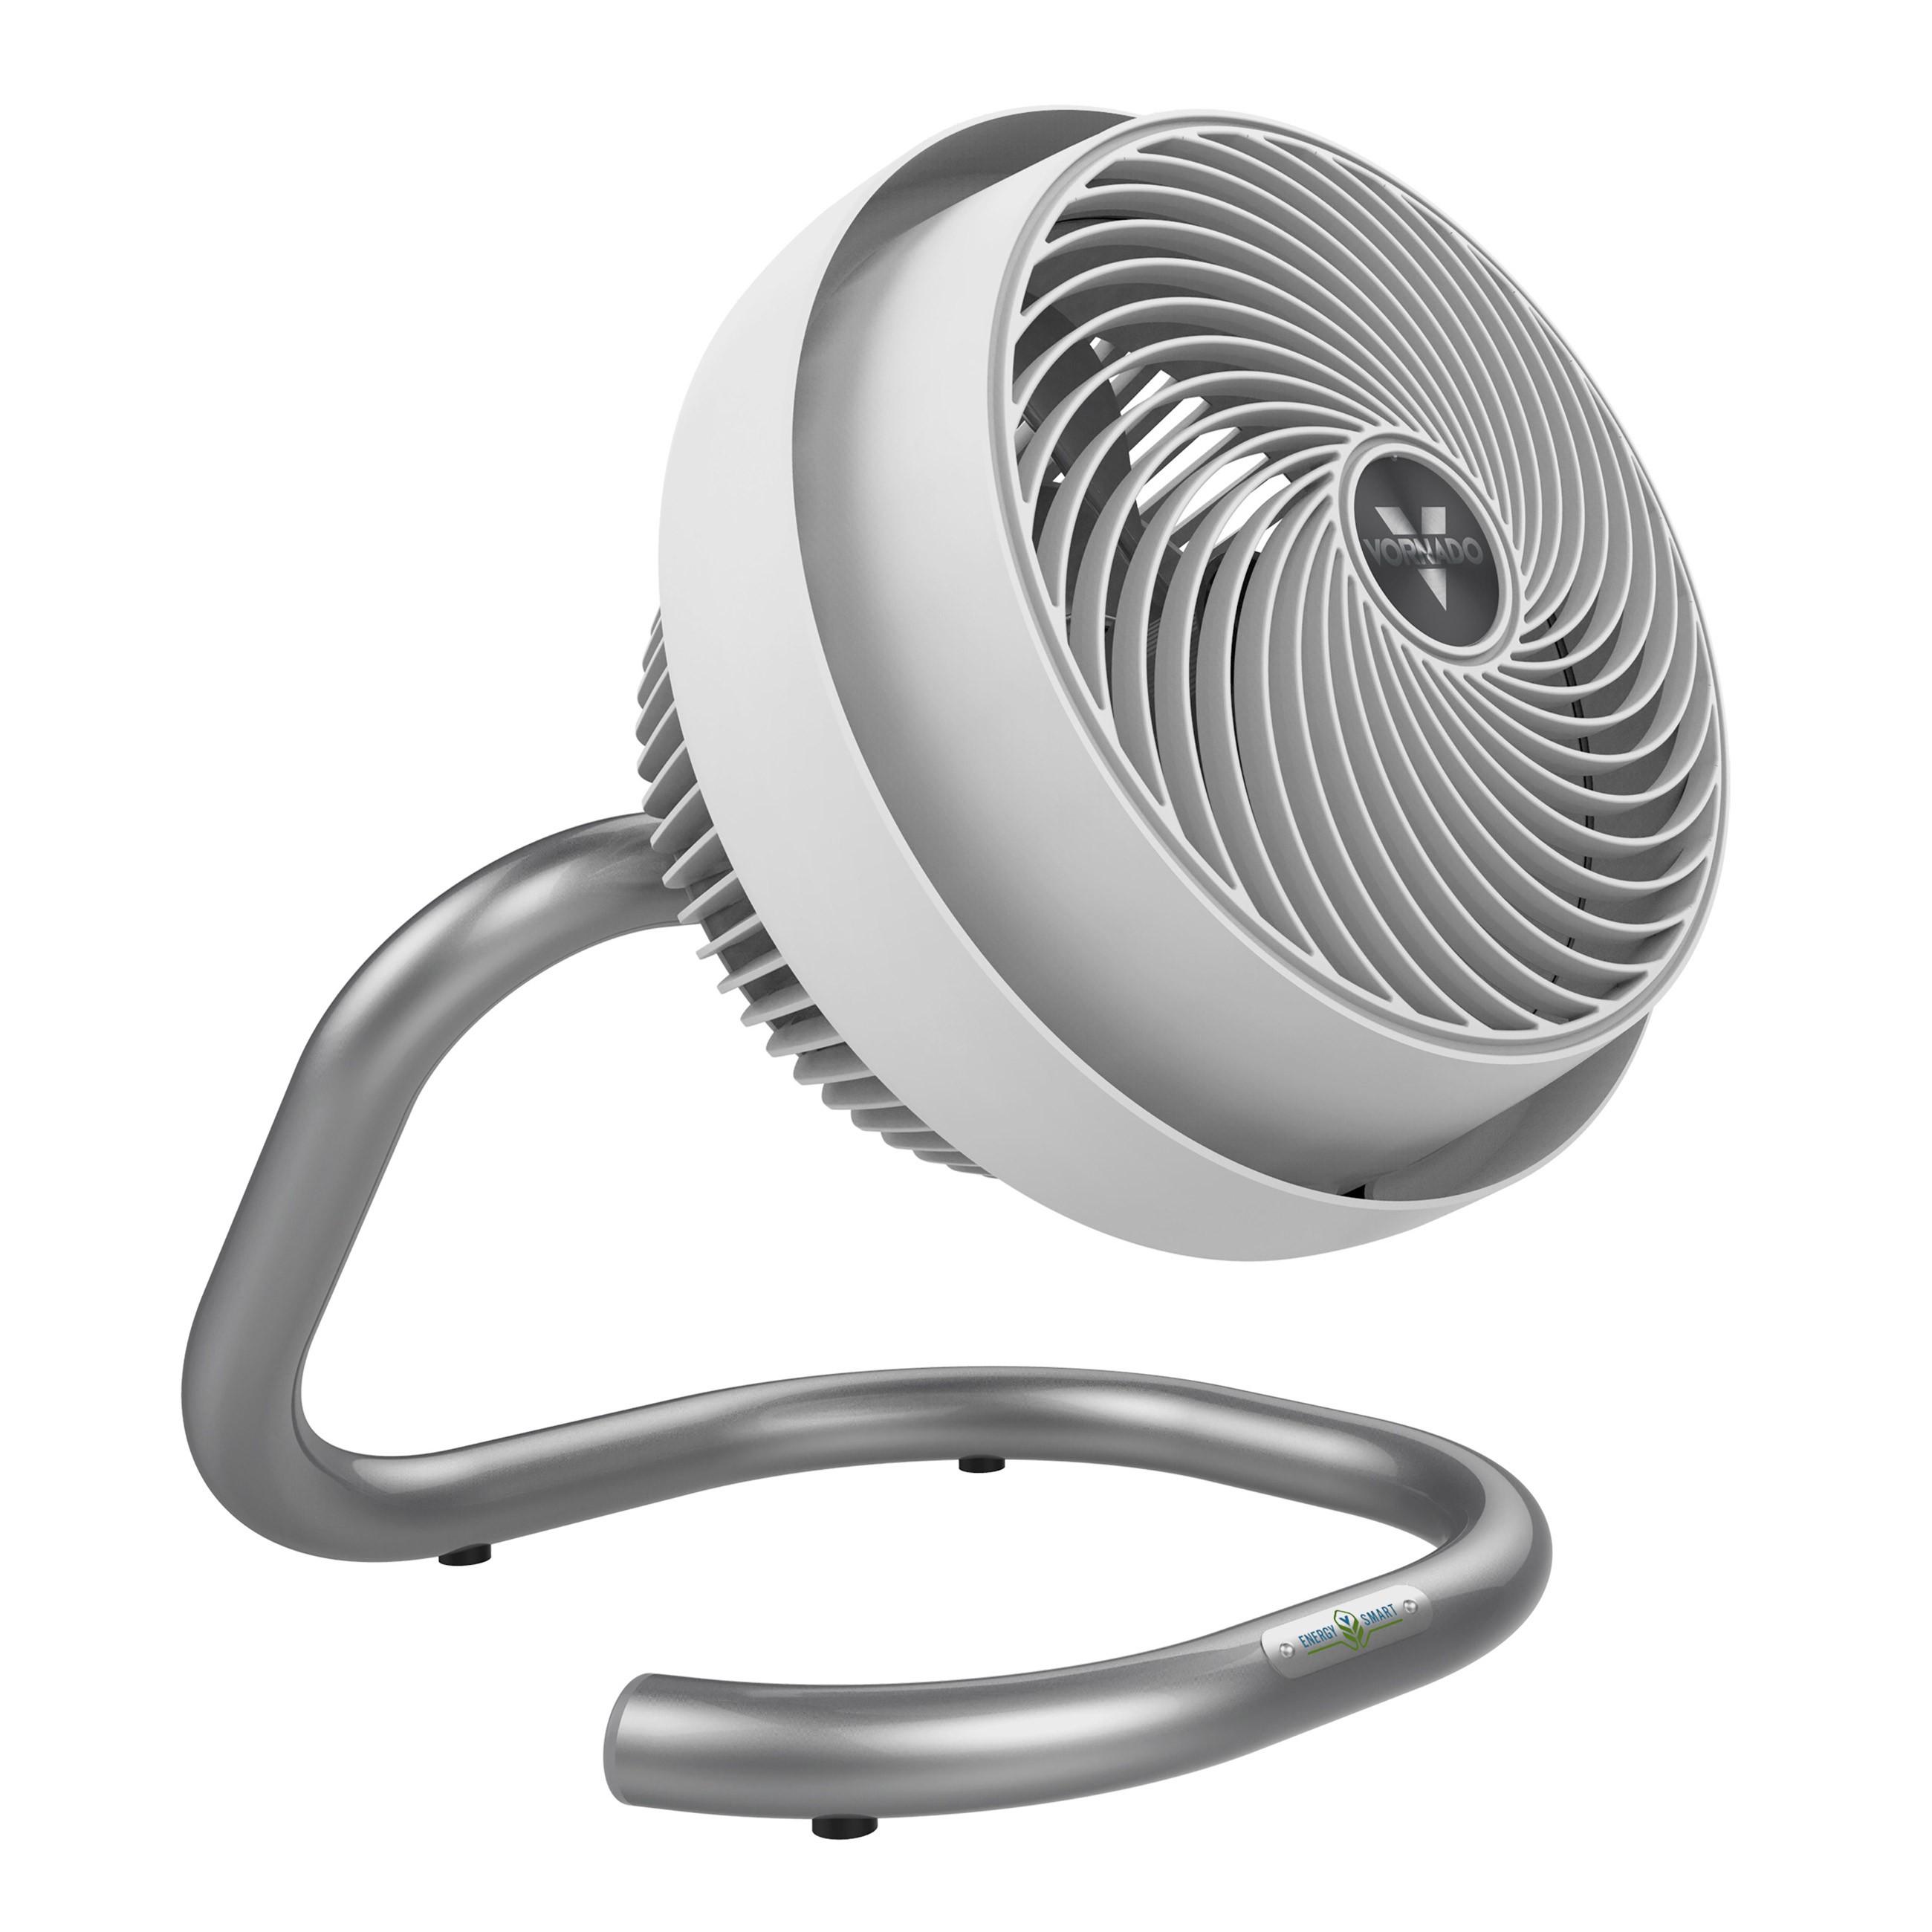 Ventilator / Bodenventilator Vornado Energy Smart 723DC Ø30cm Bild 1